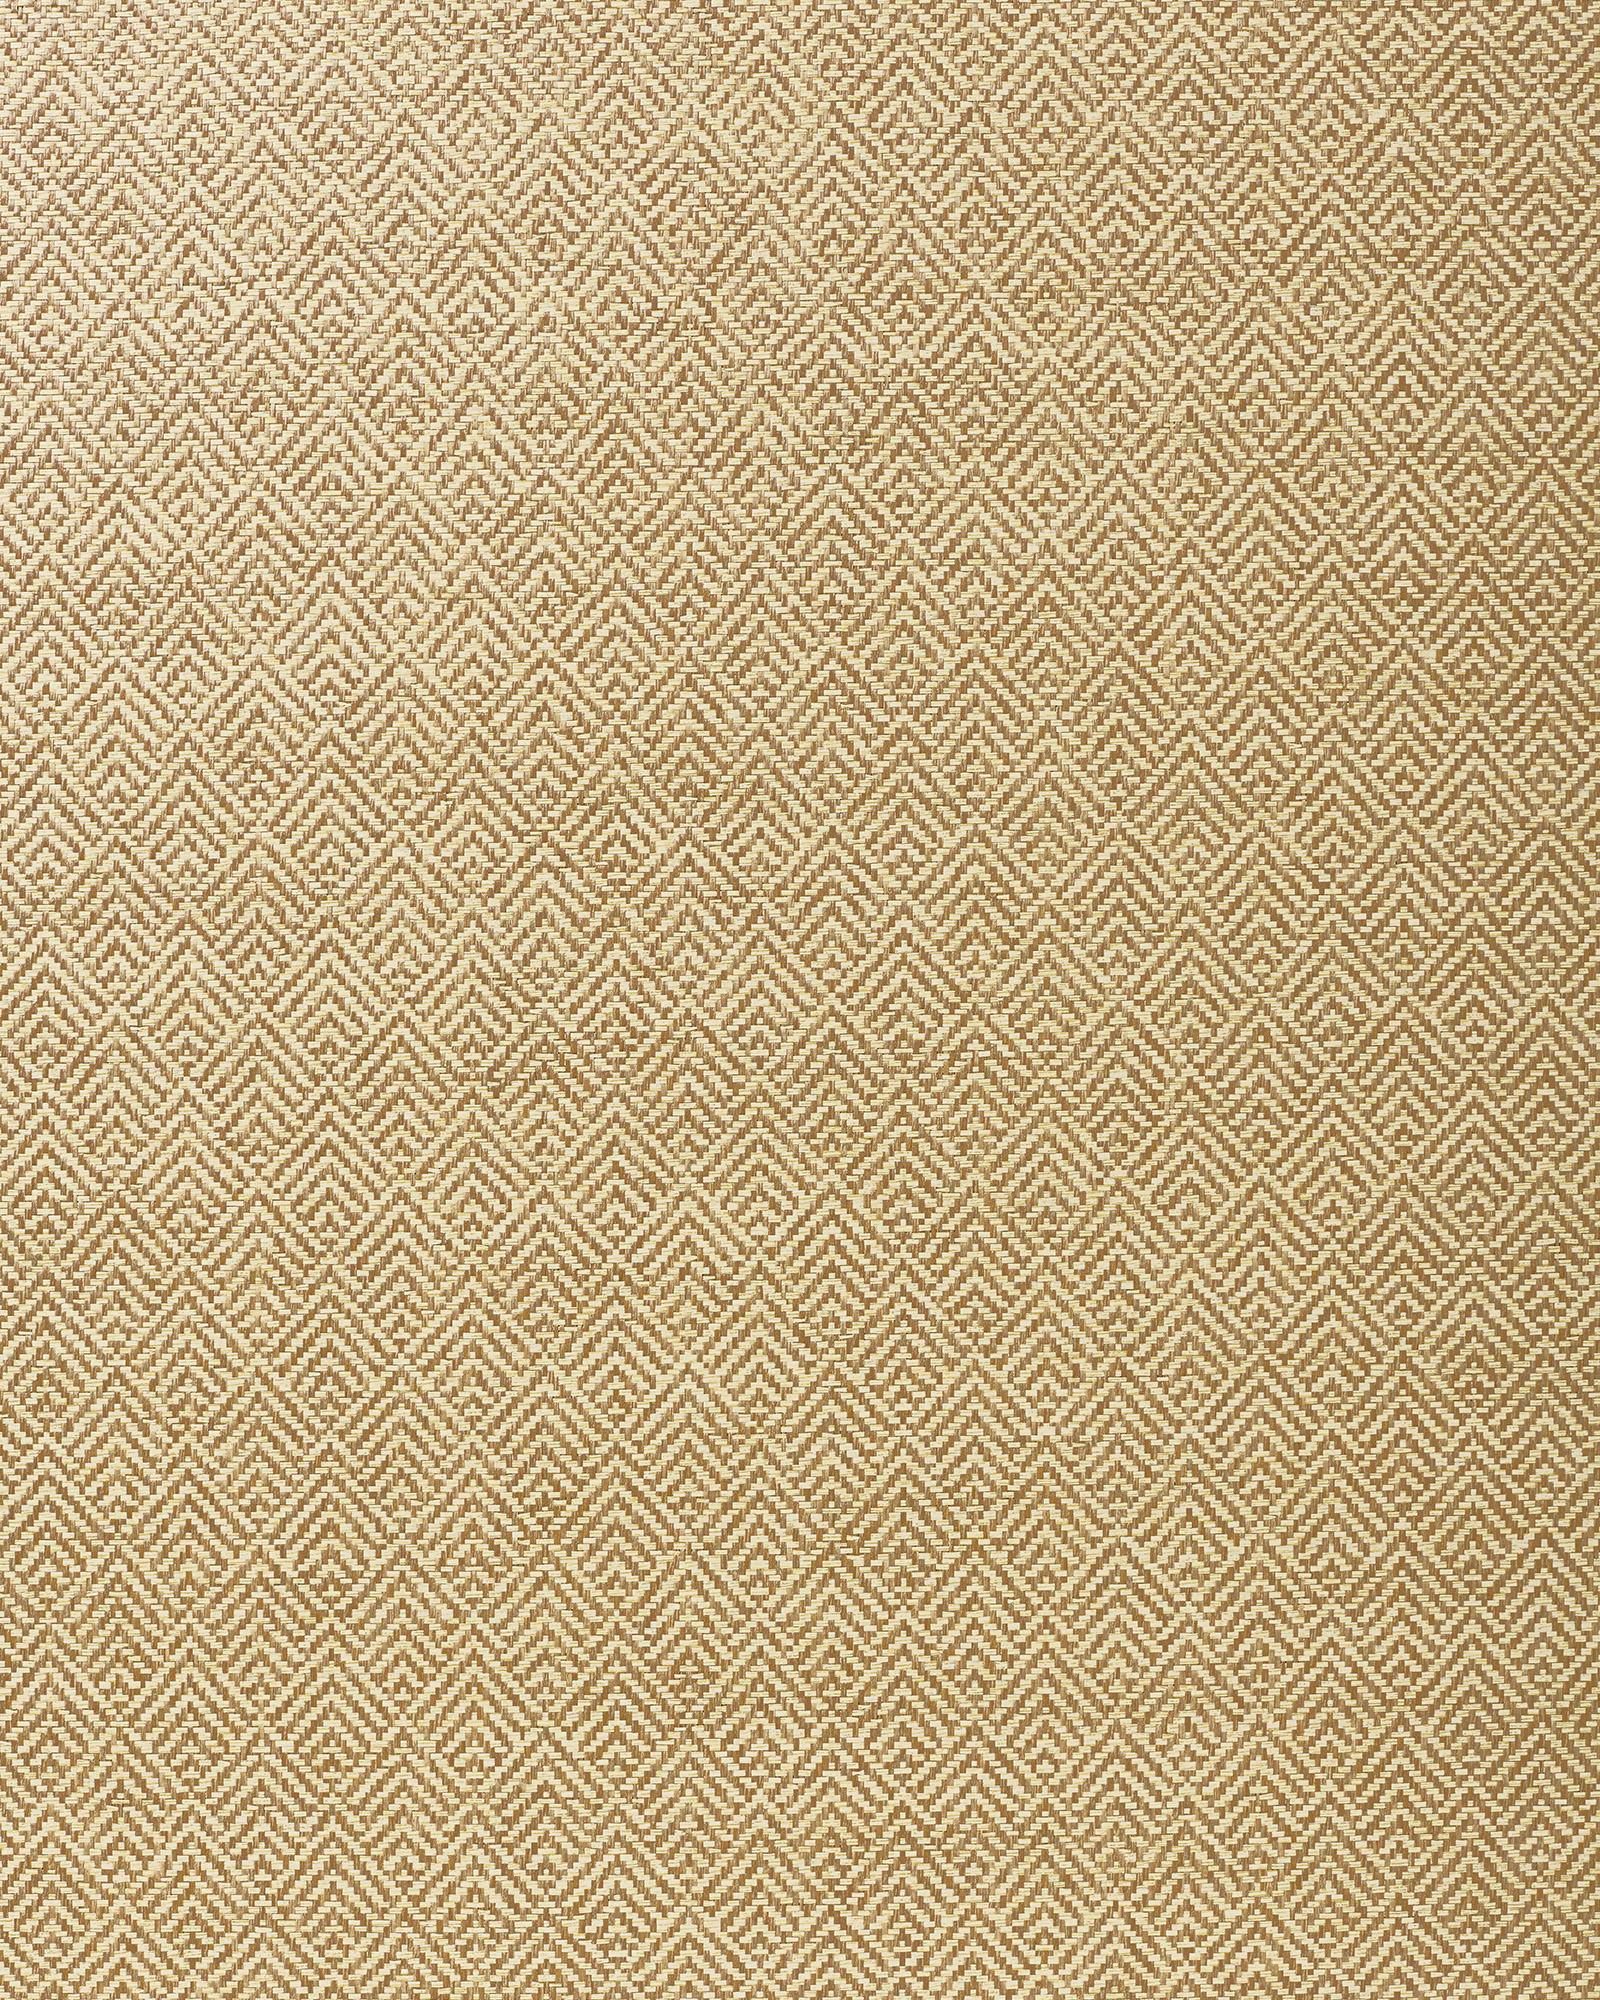 Wallpaper_Wells_Paperweave_Natural_Full_MV_0132_NoCrop_BASE.jpg